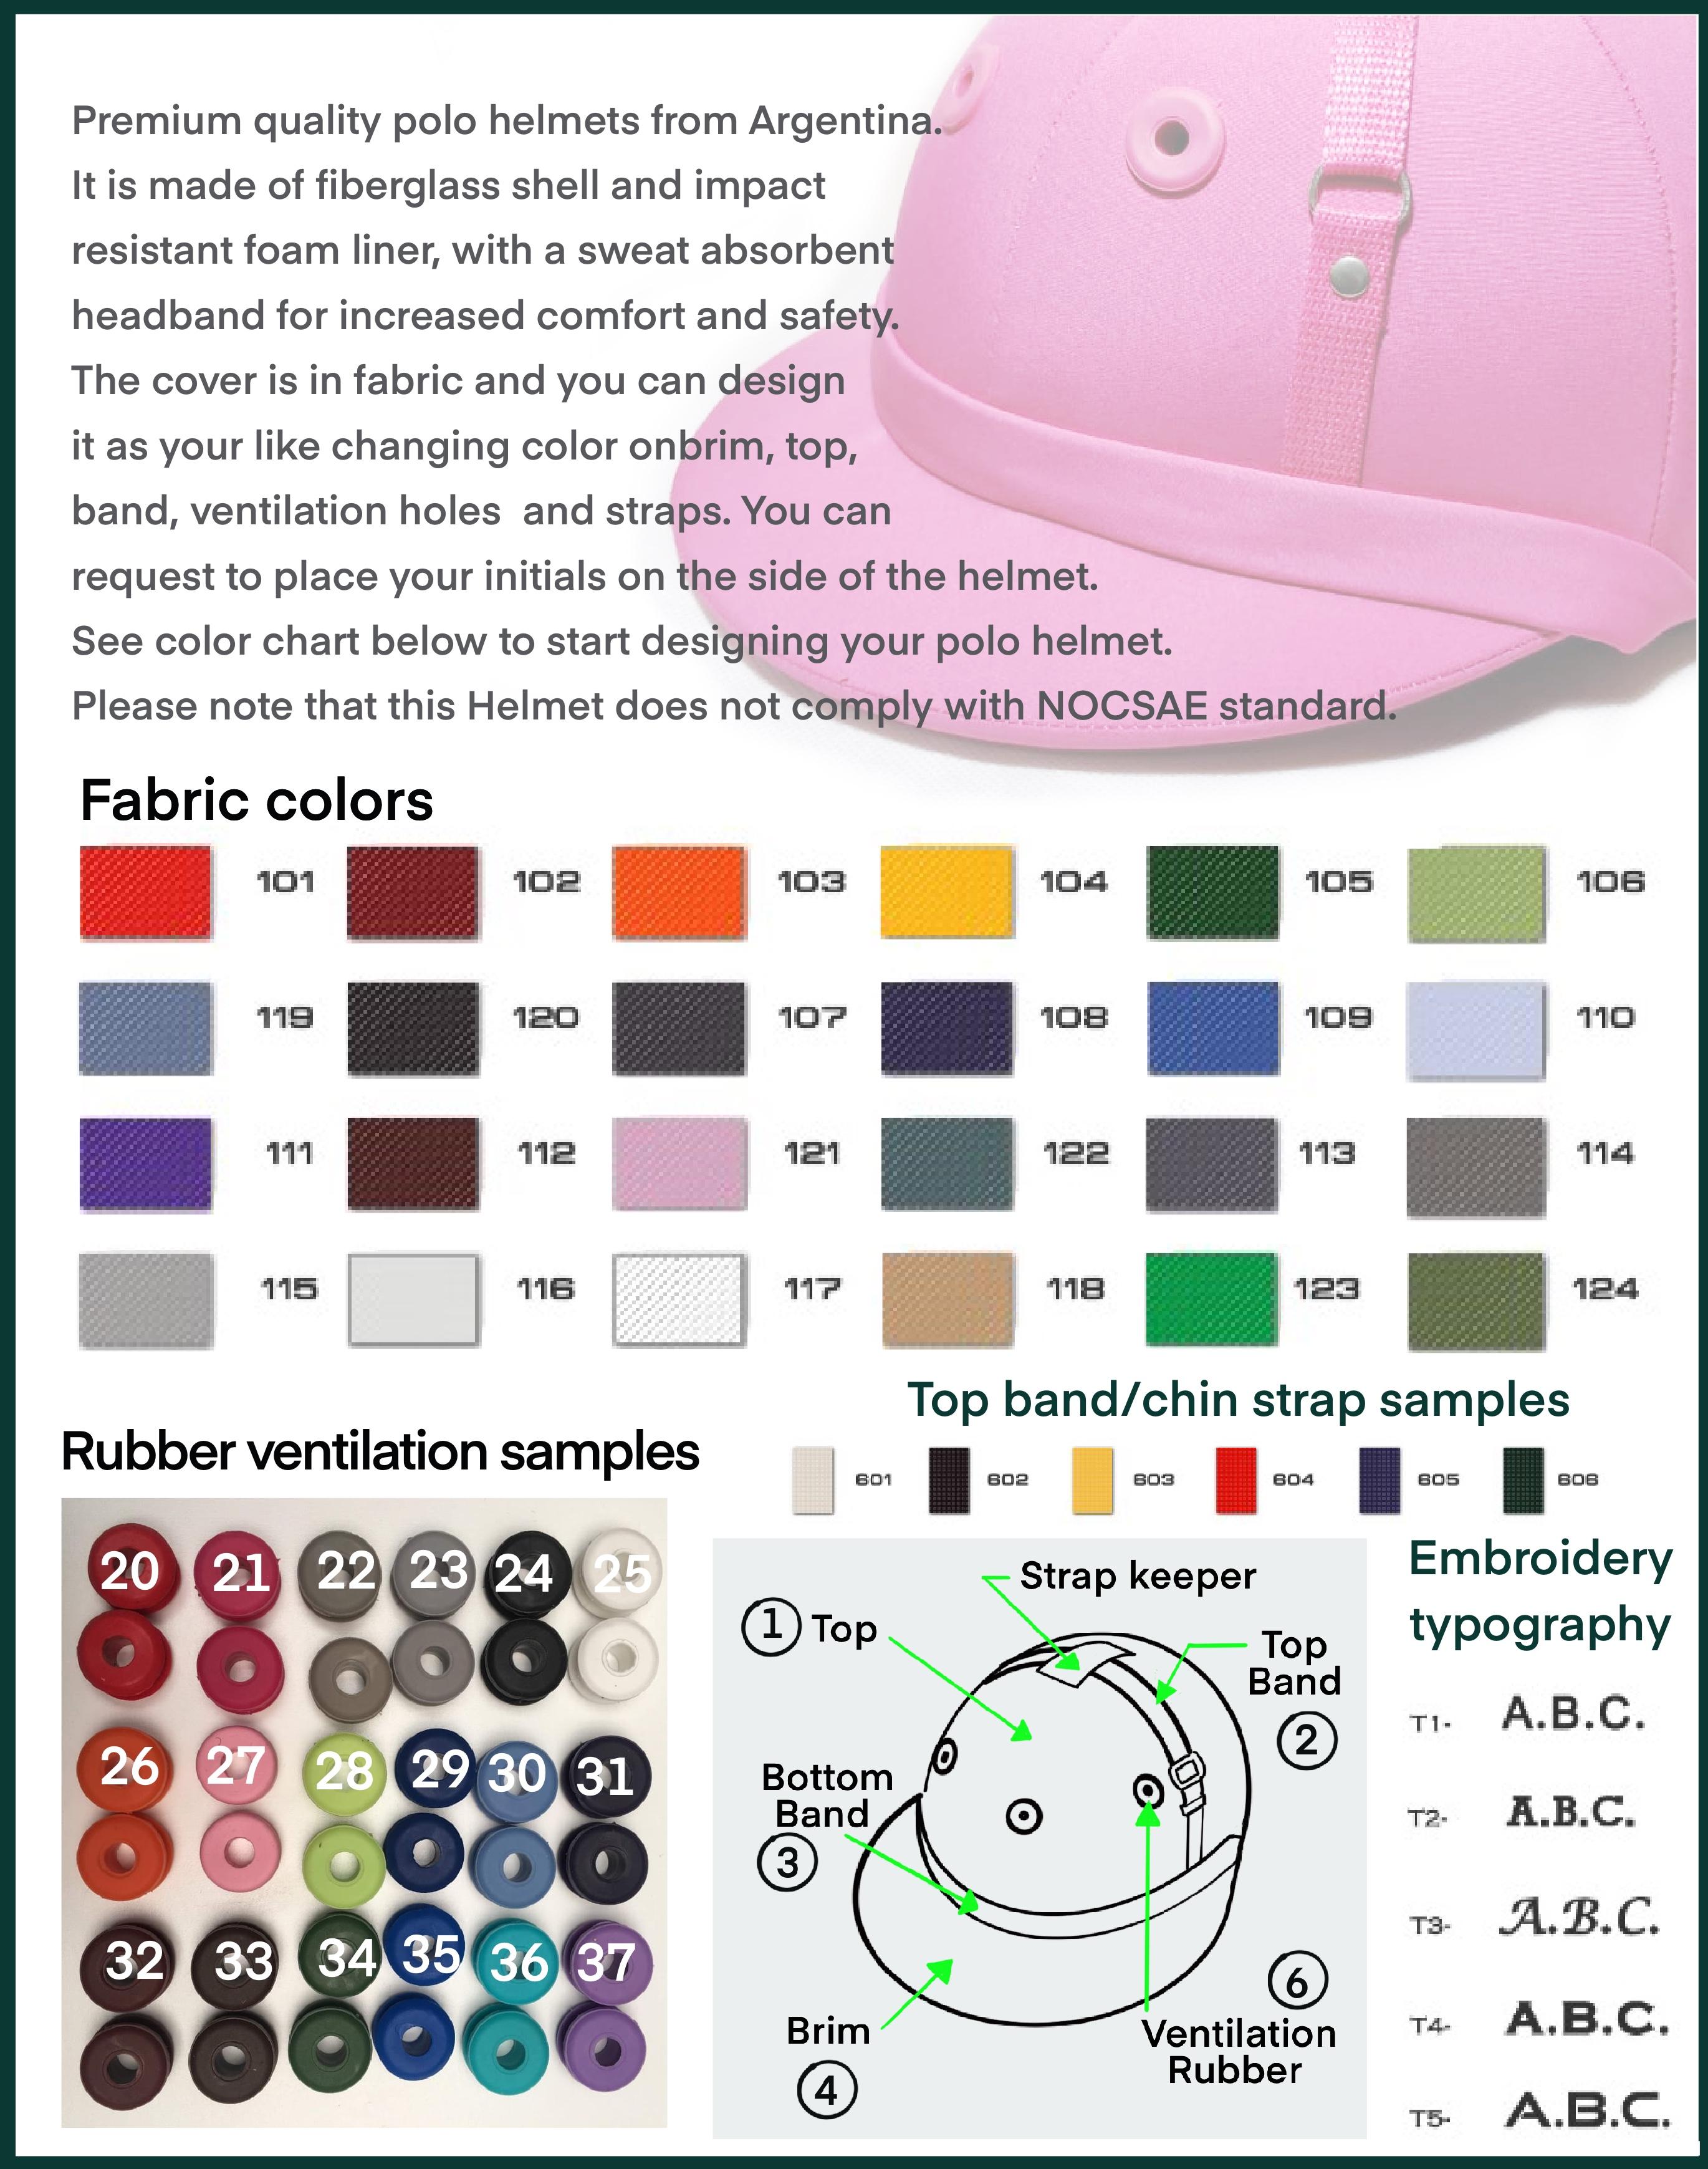 fabric-colors.jpg